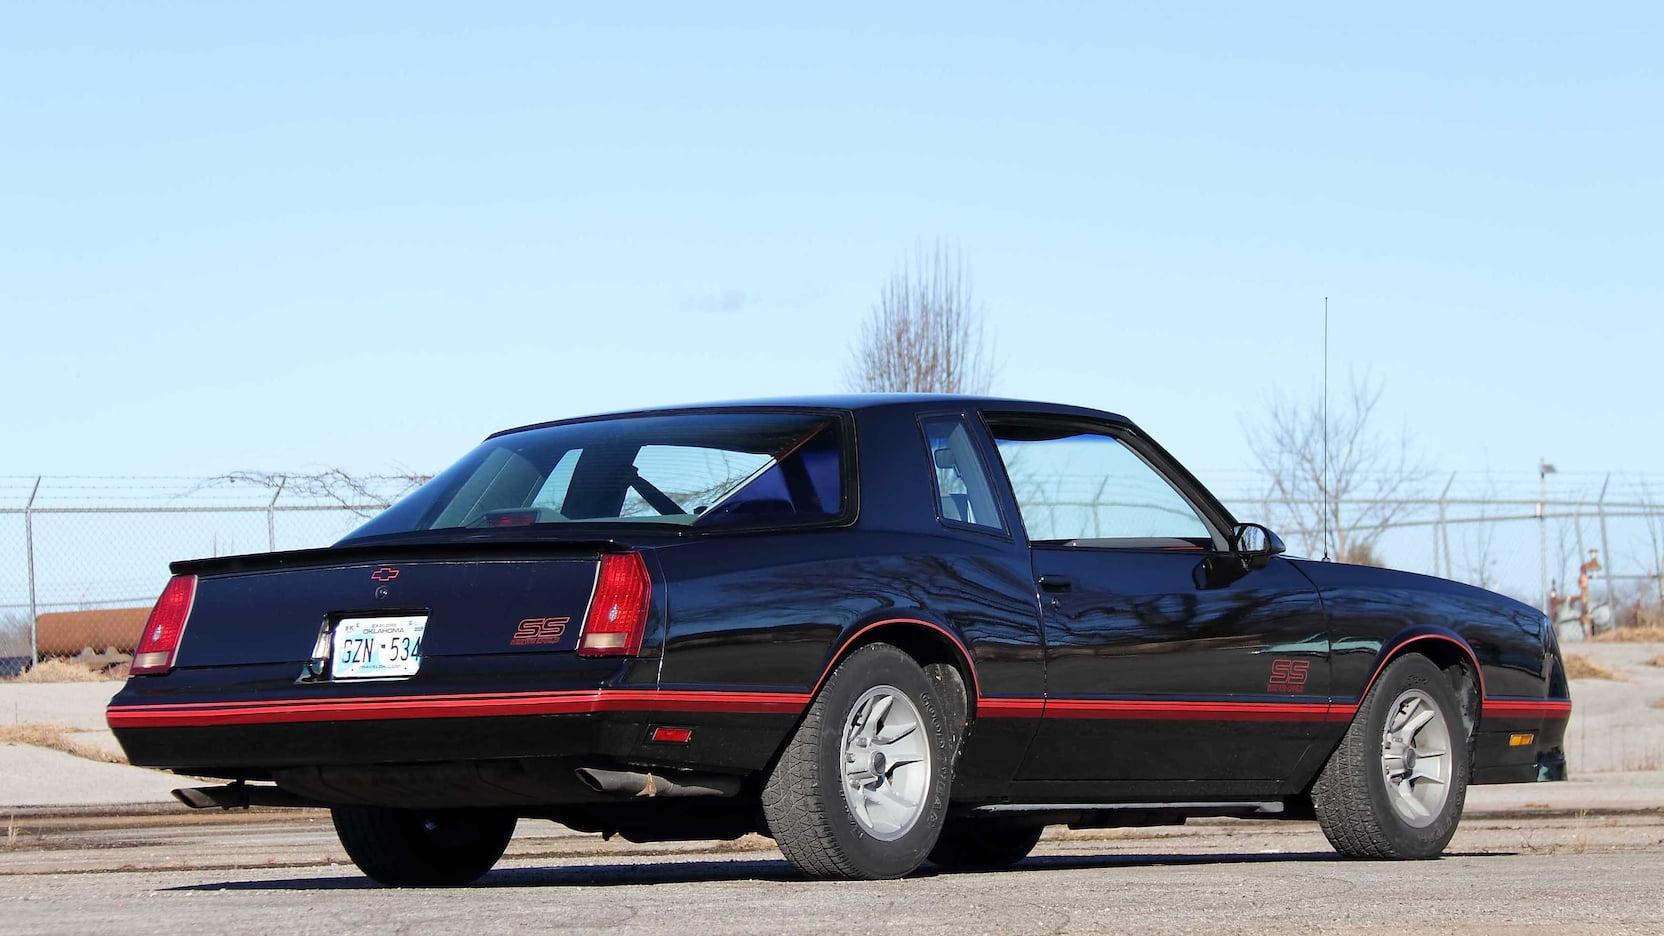 1987 Chevrolet Monte Carlo SS rear 3/4